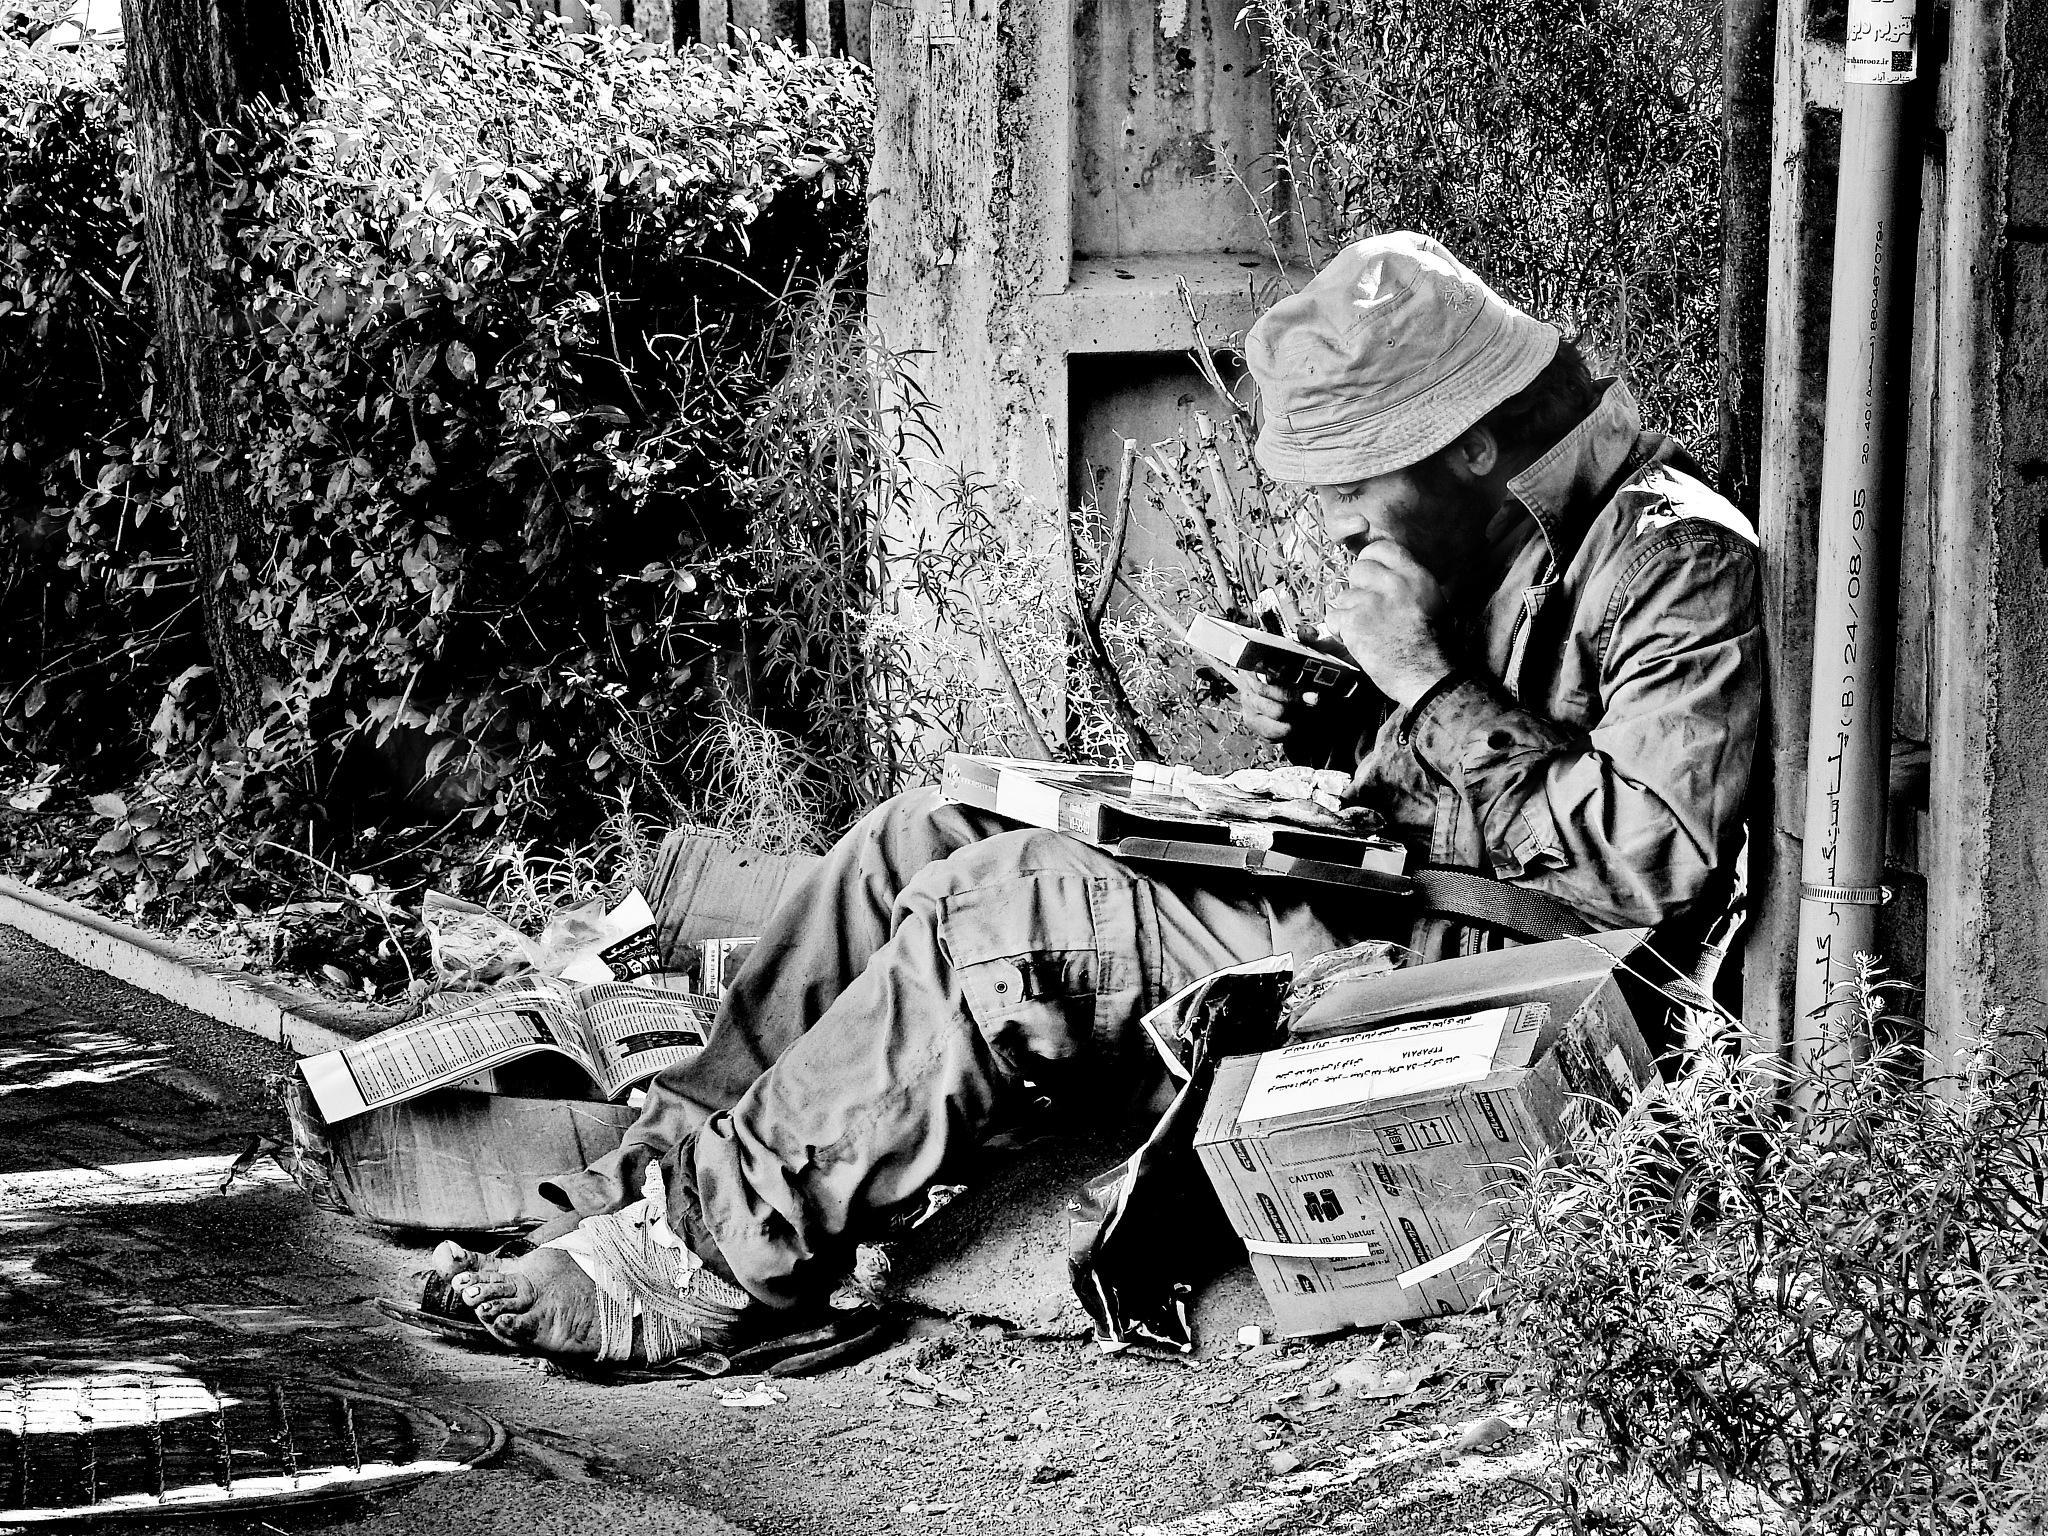 Homeless by Aahmad Hezavei